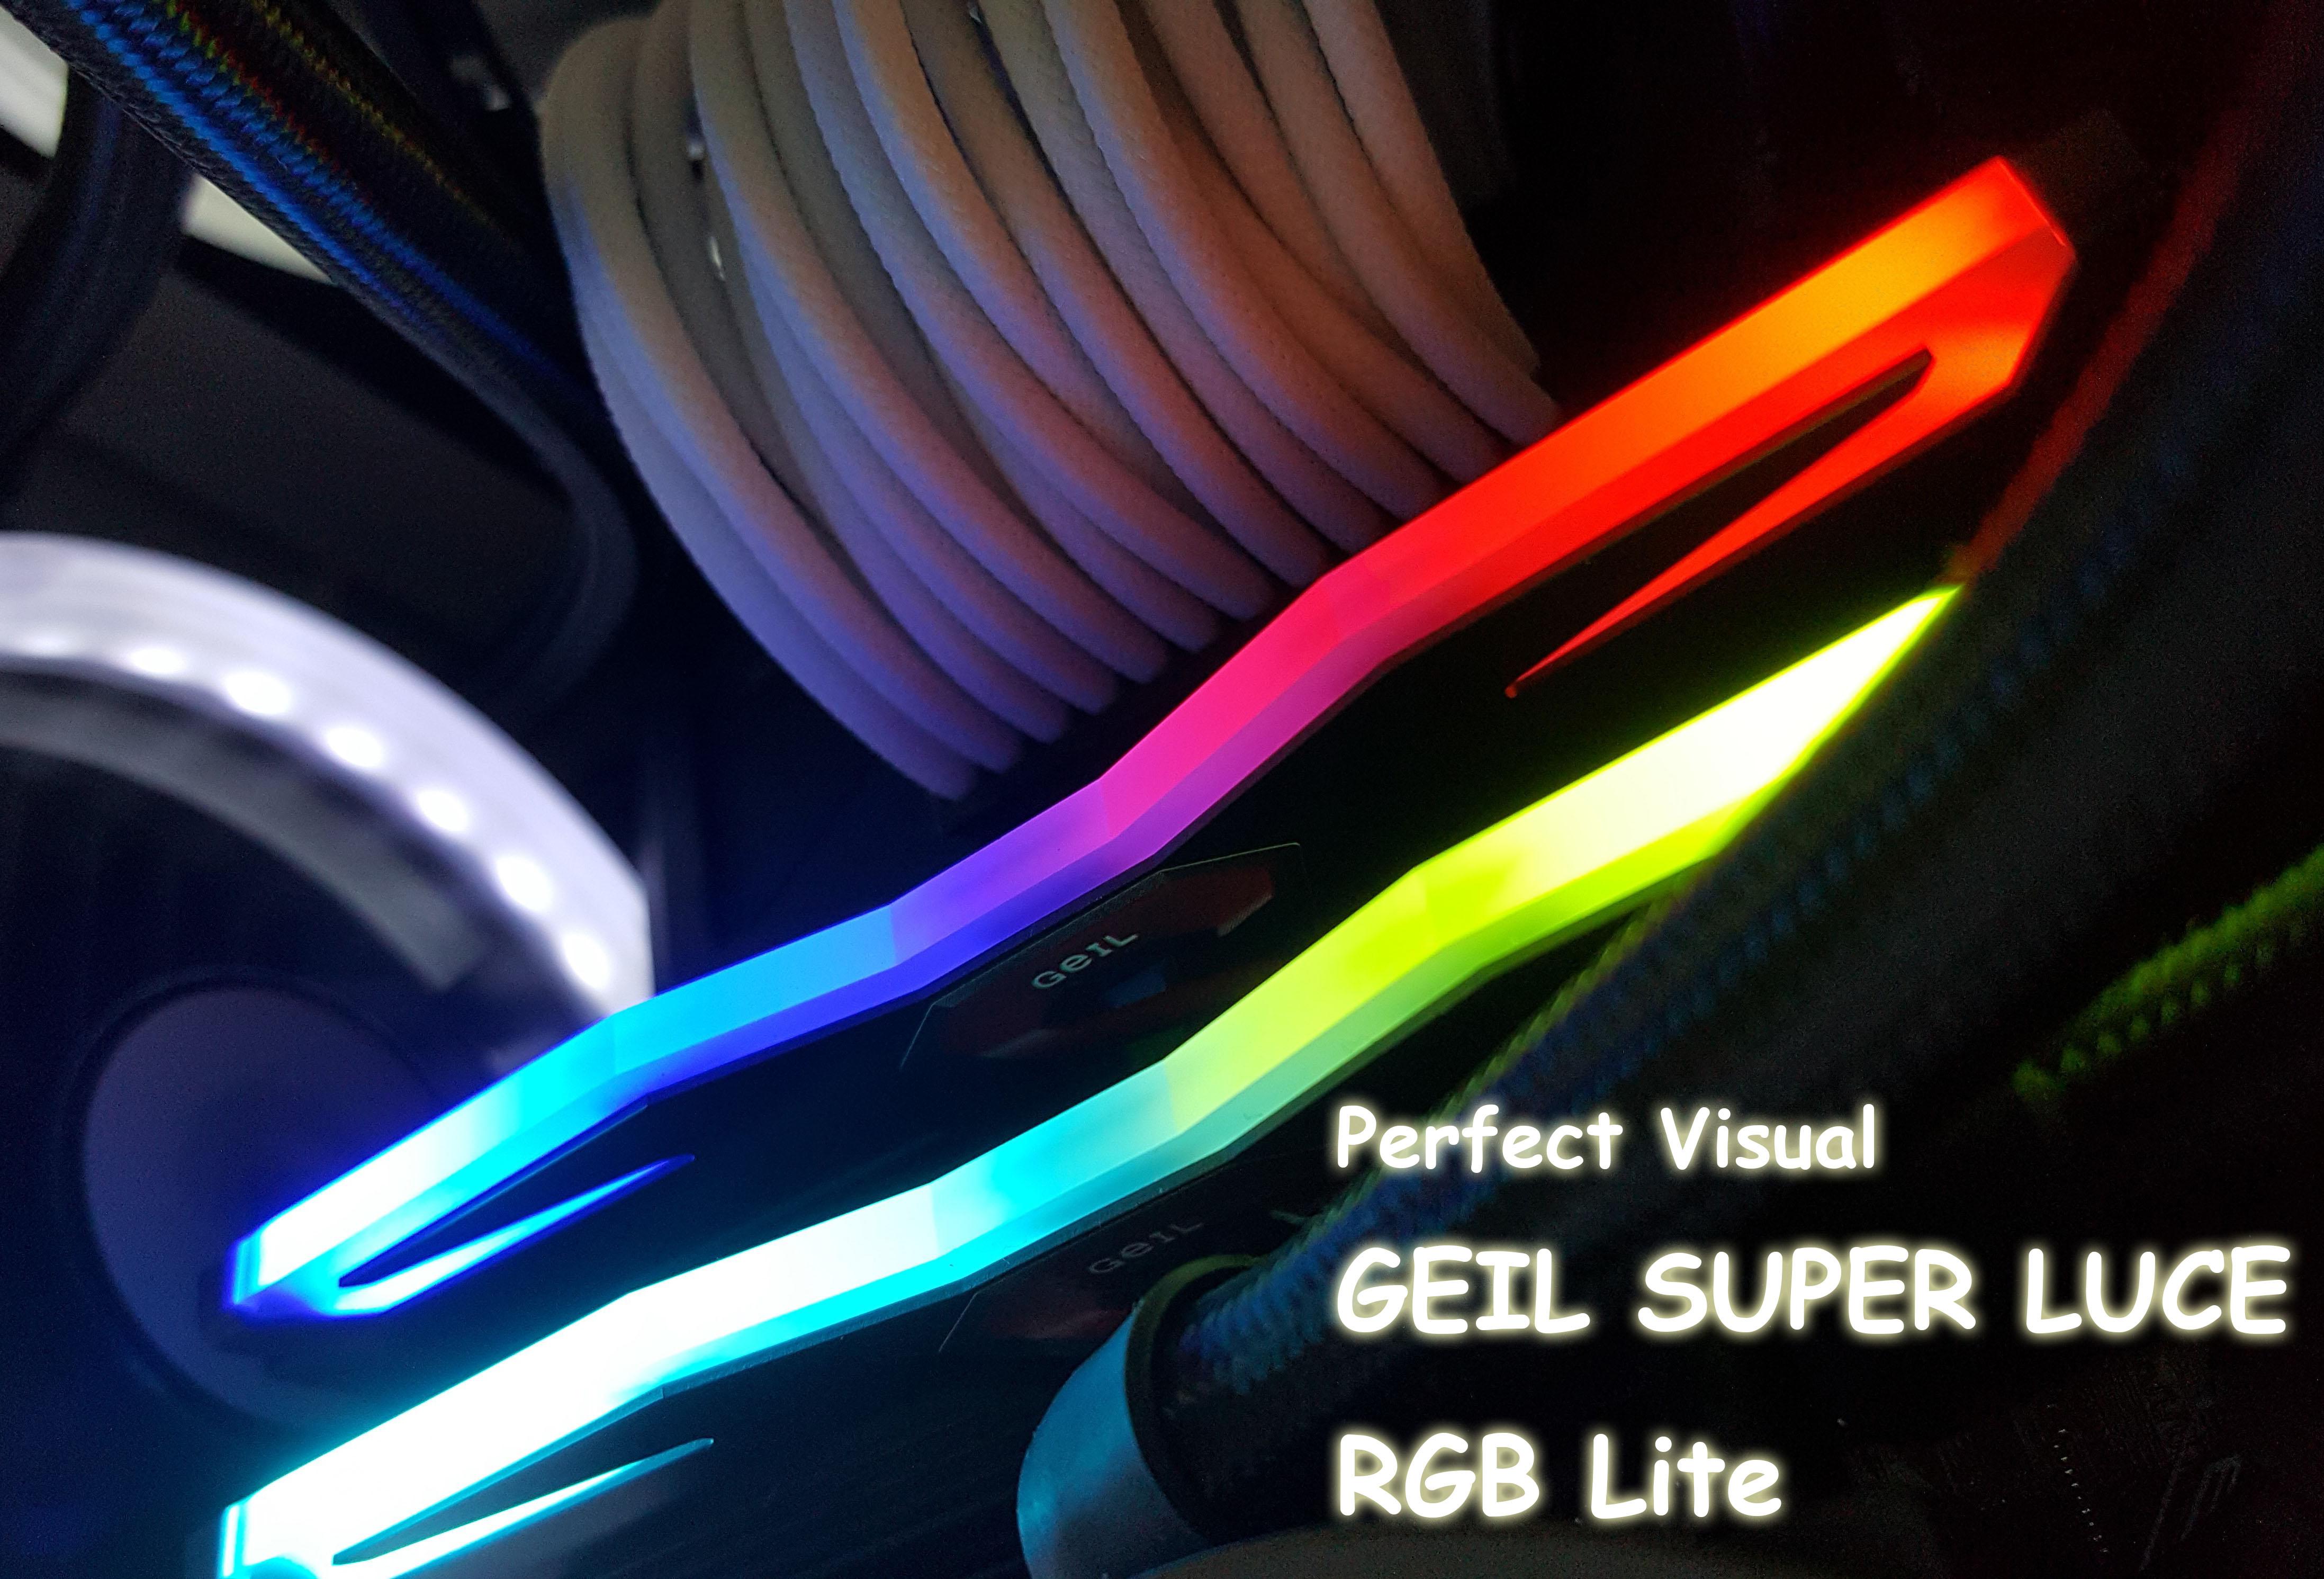 Perfect Visual - Geil Super Luce RGB Lite